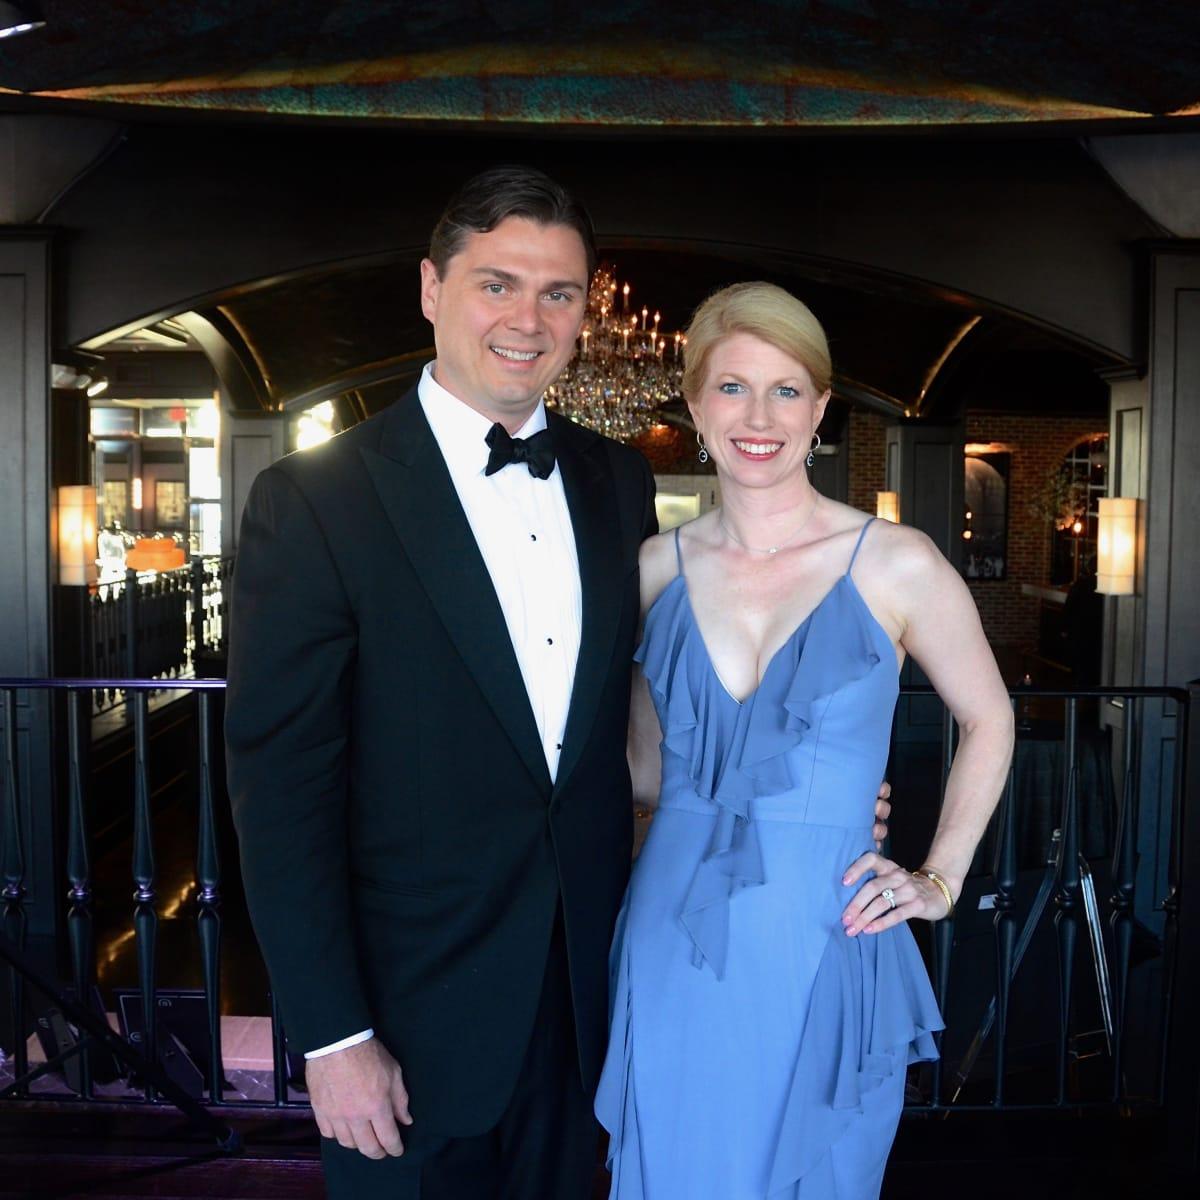 Collin Cox, Jacquelyn Cox at 2017 Da Camera Gala